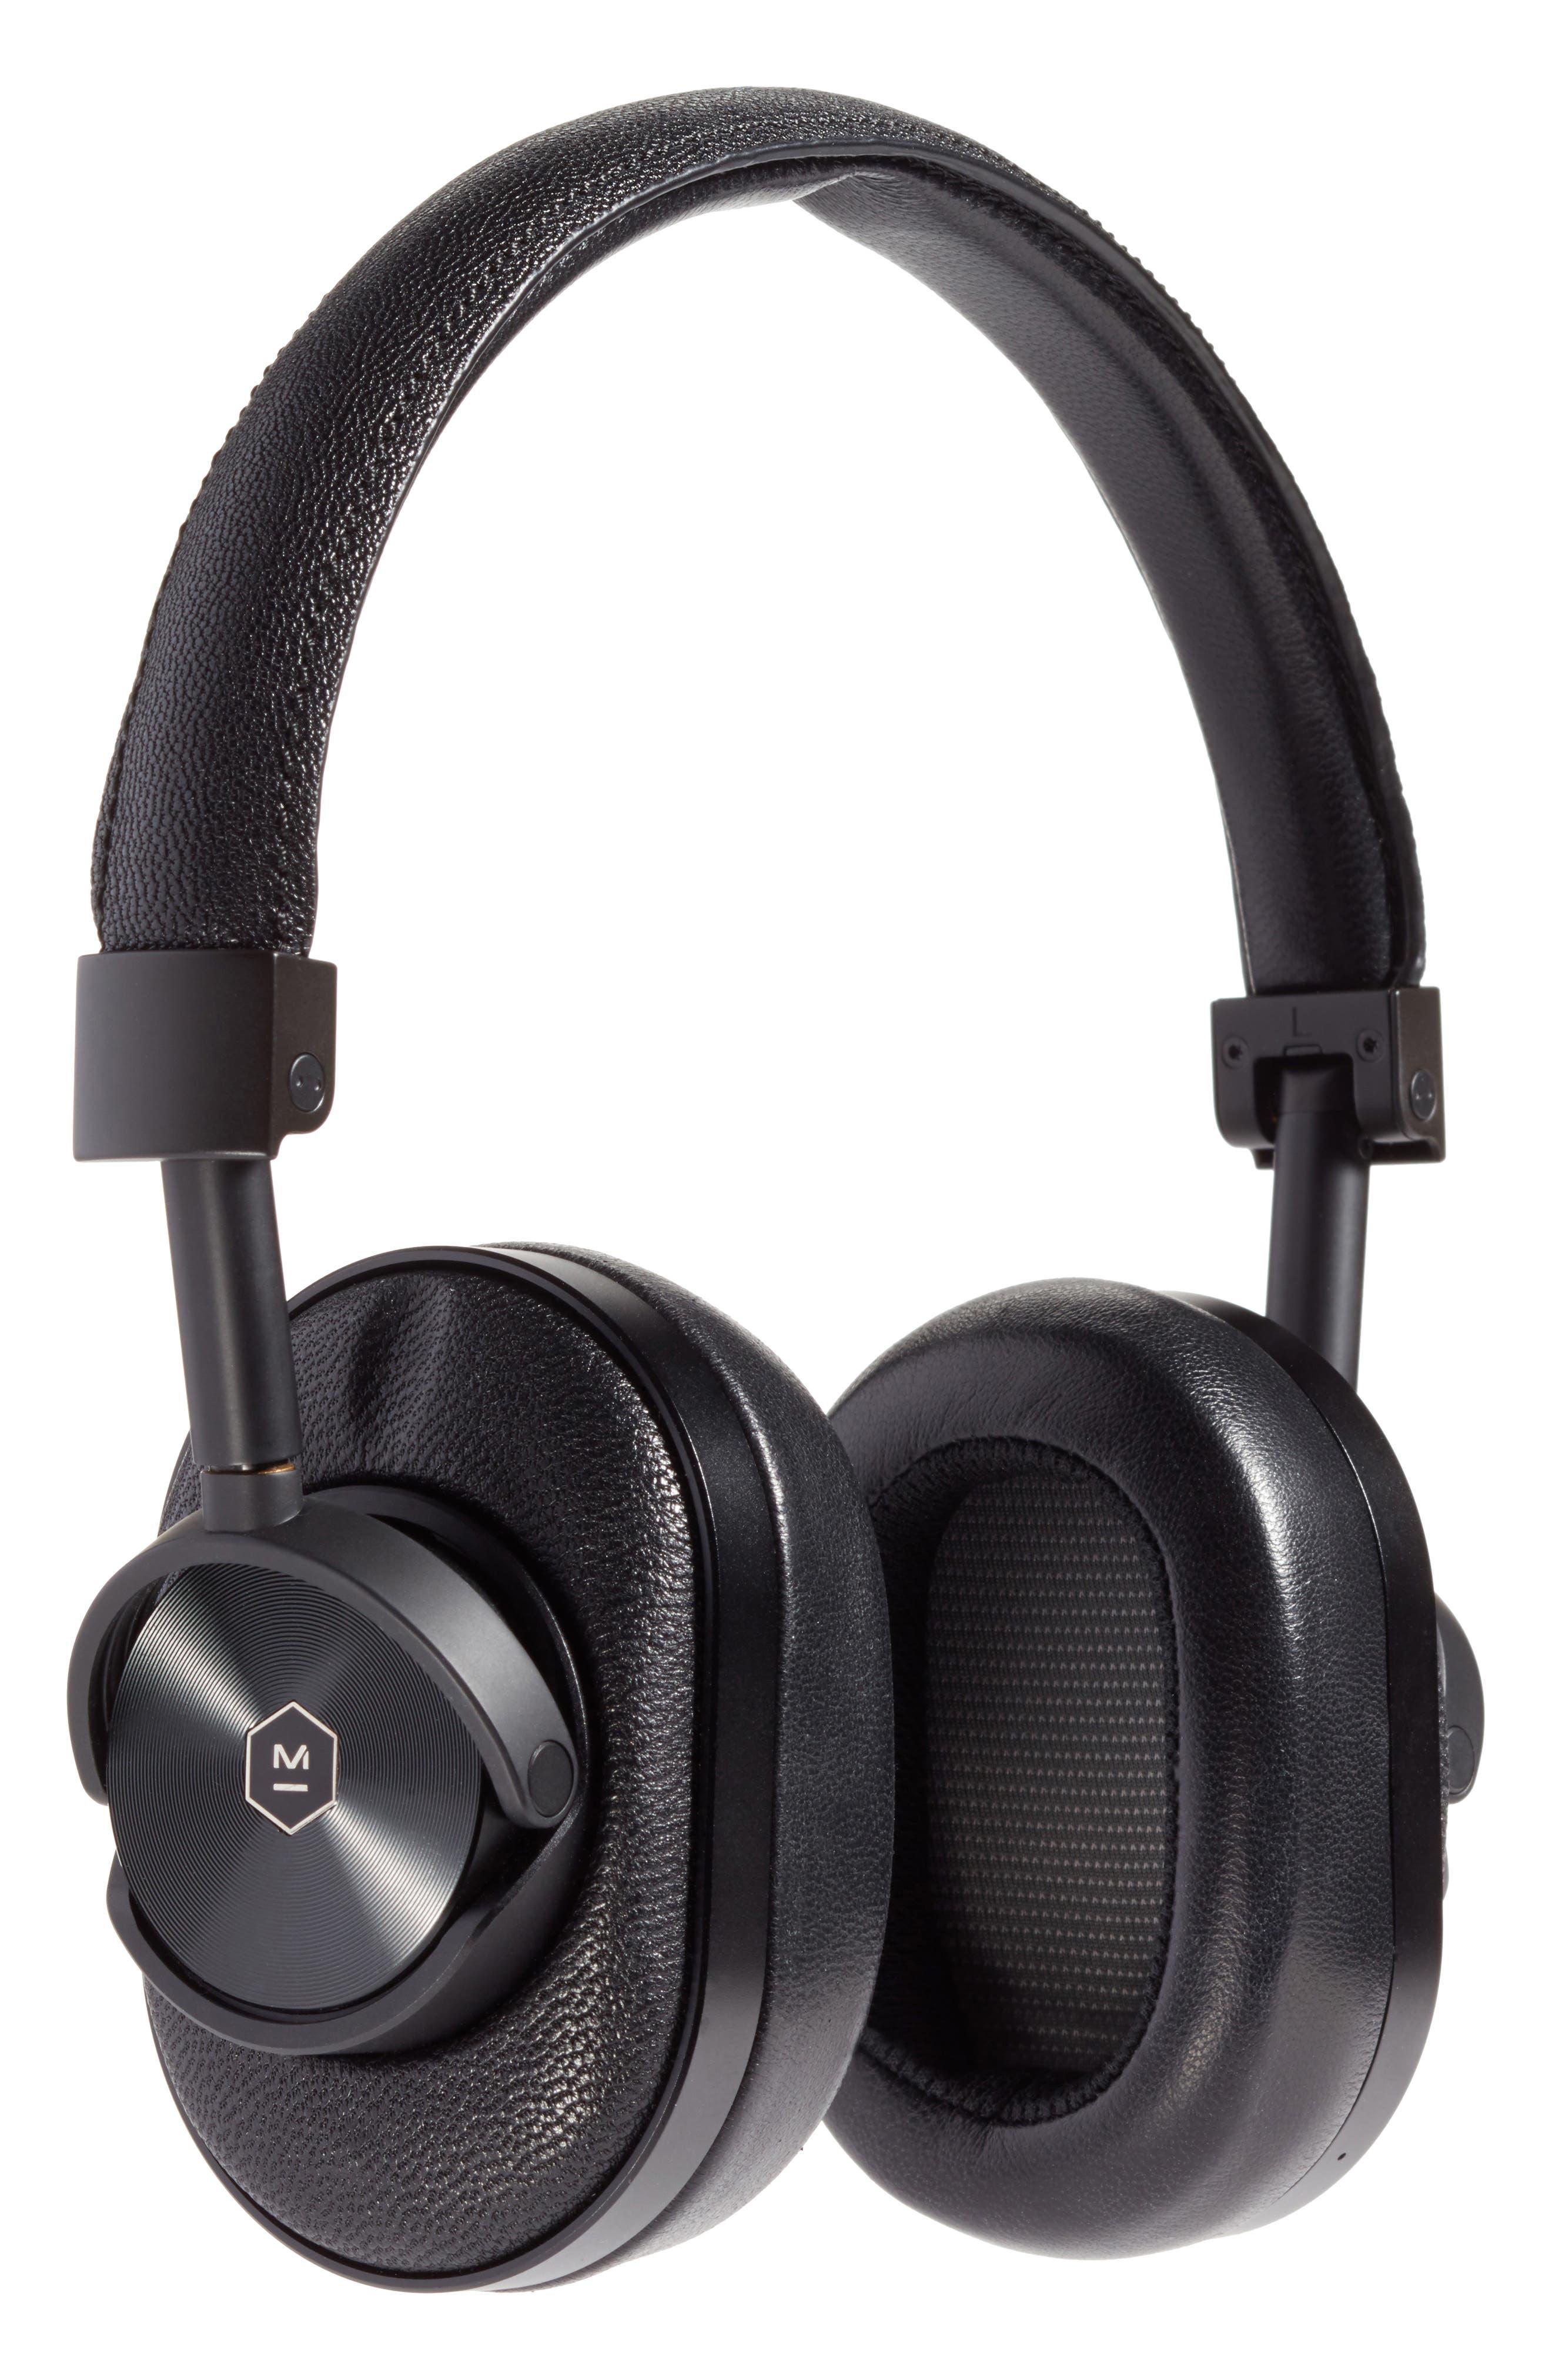 Main Image - Master & Dynamic MW60 Wireless Over-Ear Headphones